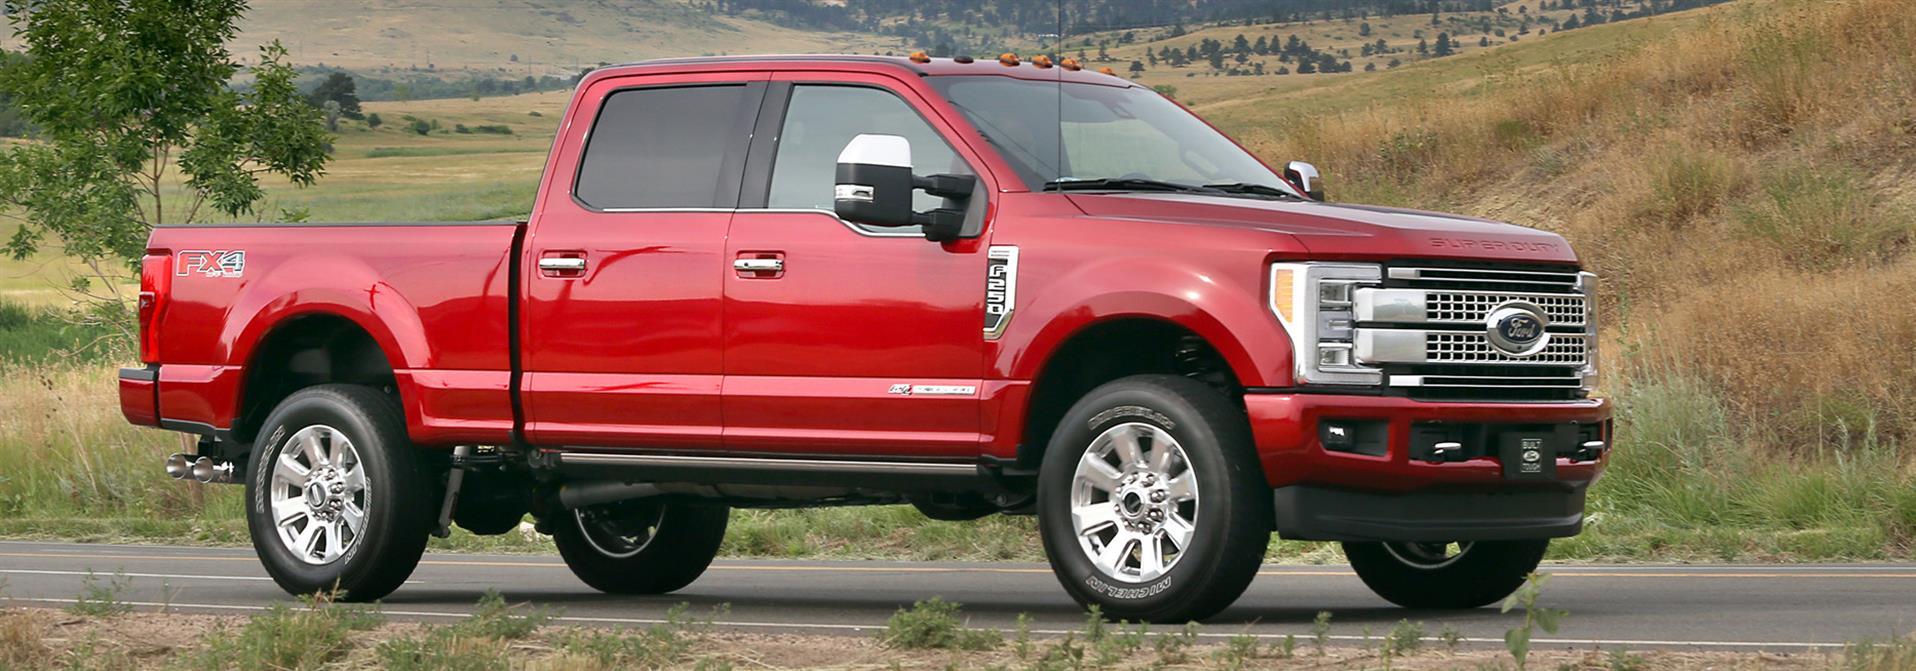 Lv Cars Auto Sales Airport Las Vegas Nv New Used Cars Trucks